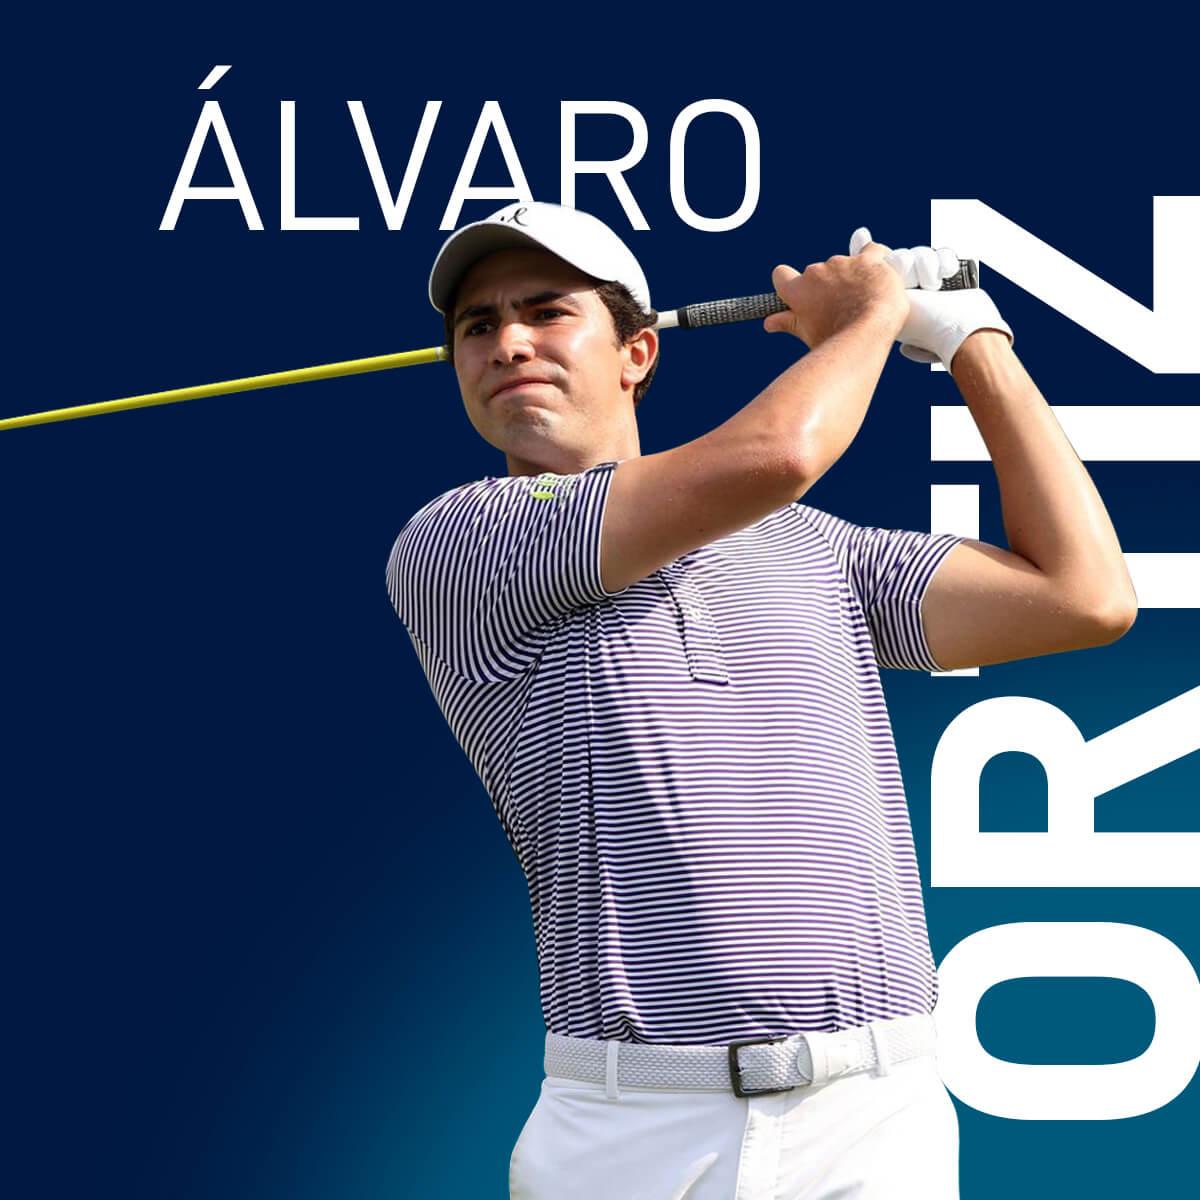 Álvaro Ortiz